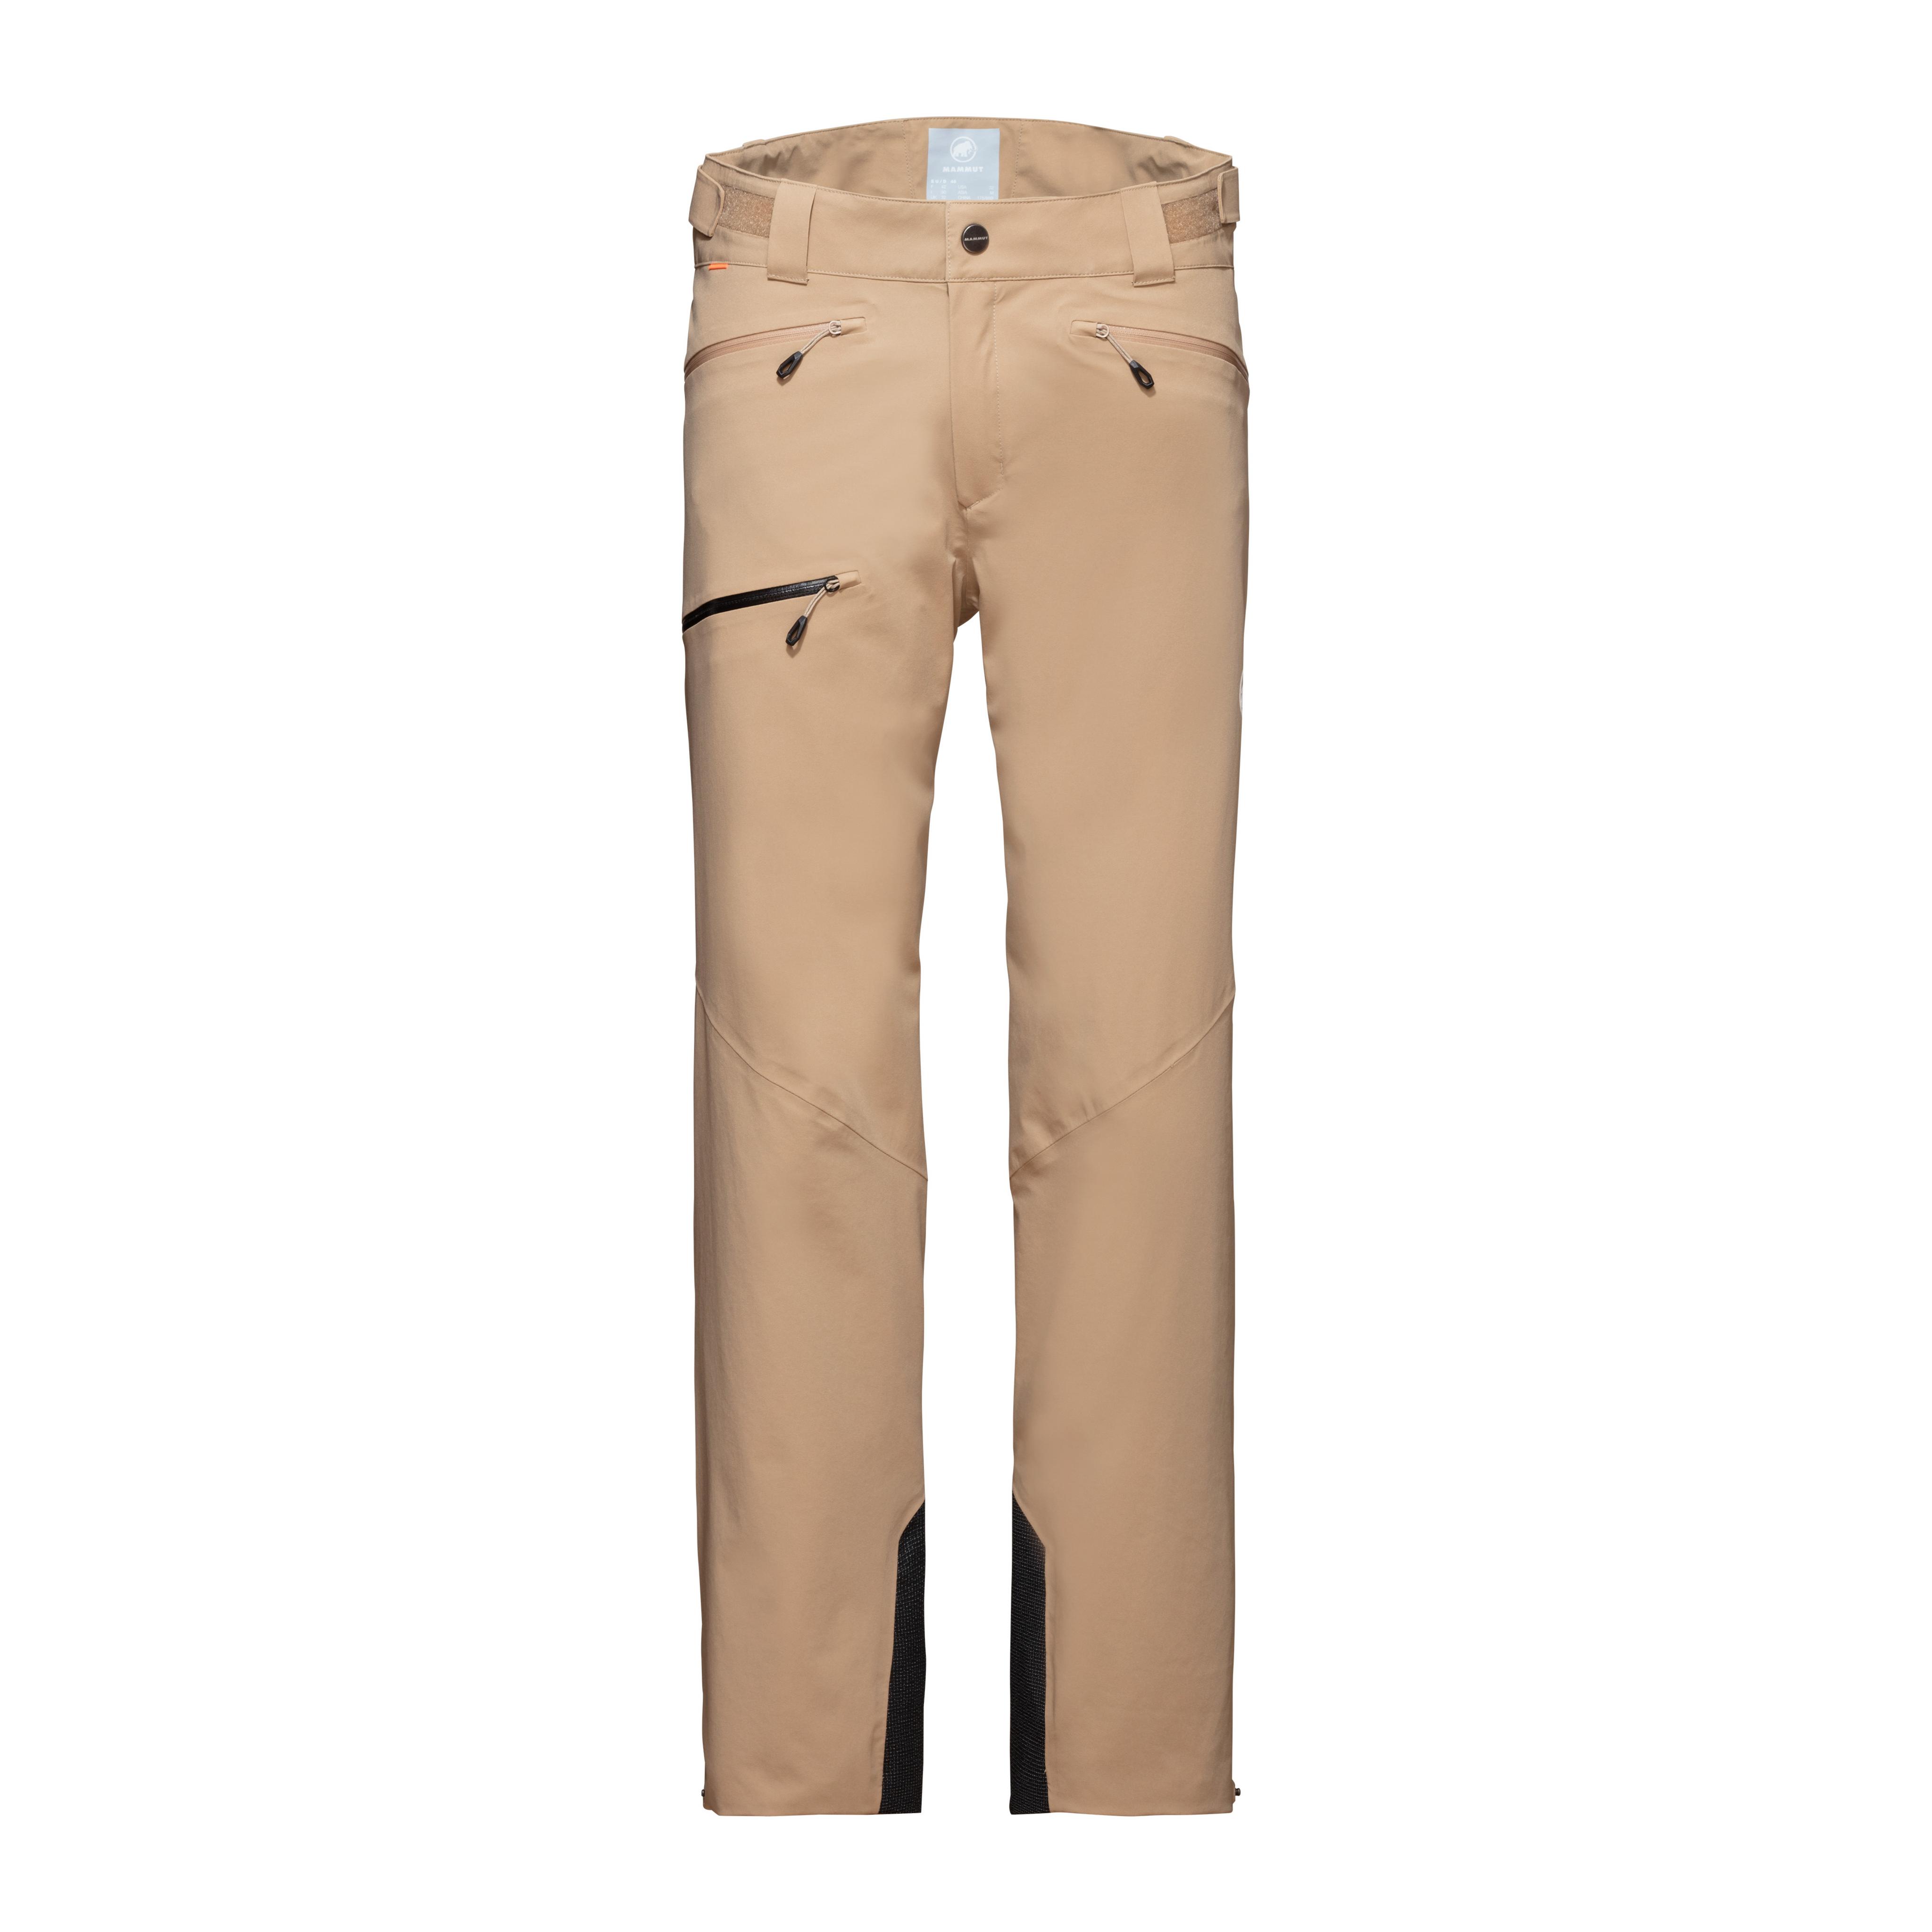 Stoney HS Thermo Pants Men - dark safari, normal, UK 28 thumbnail